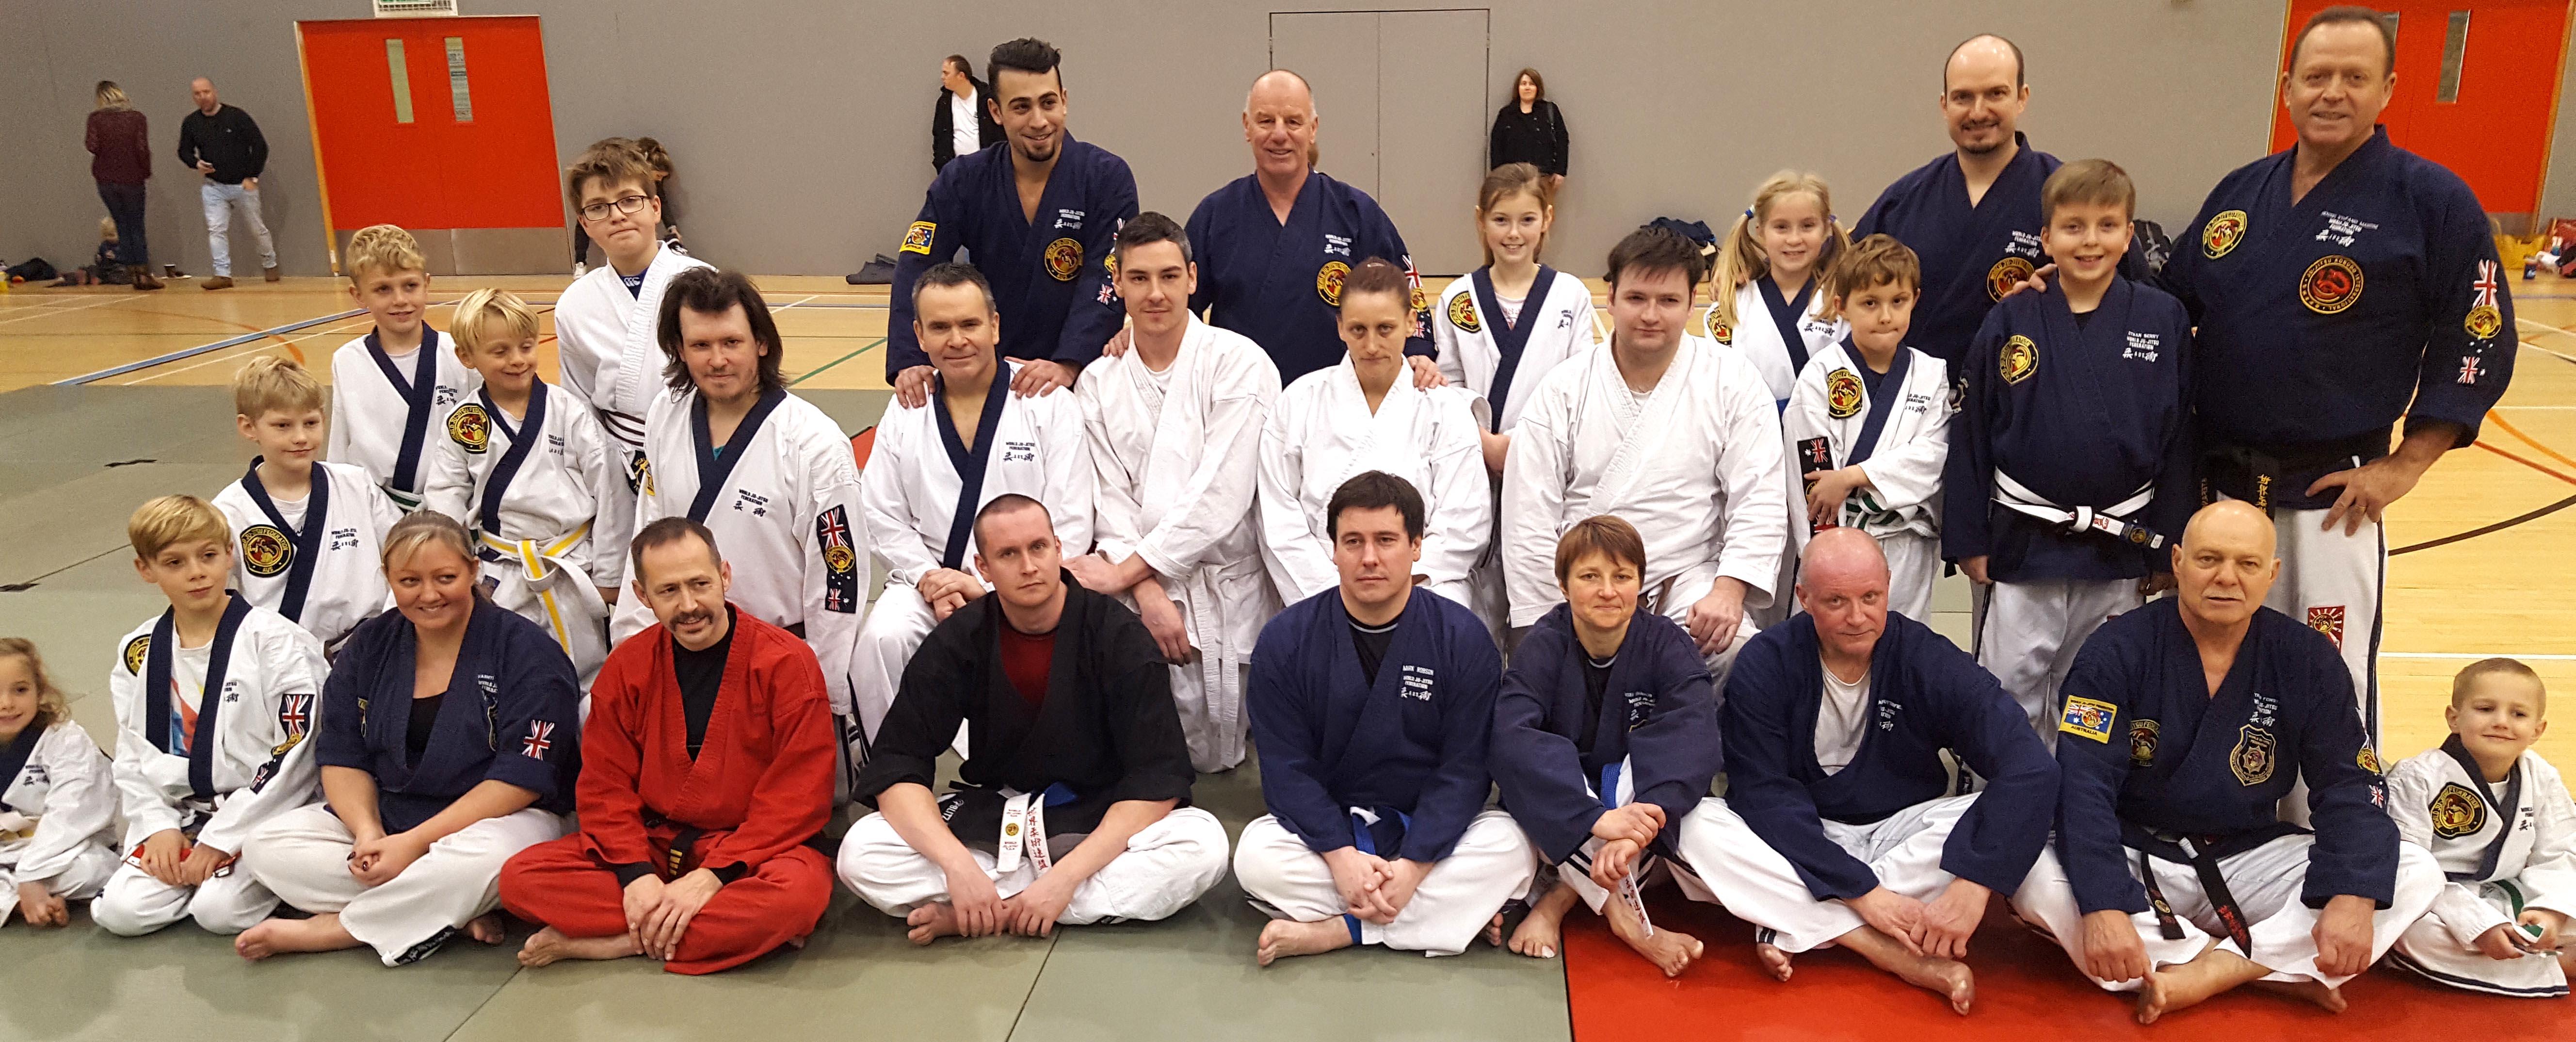 Aycliffe Ju-Jitsu Club Thrives